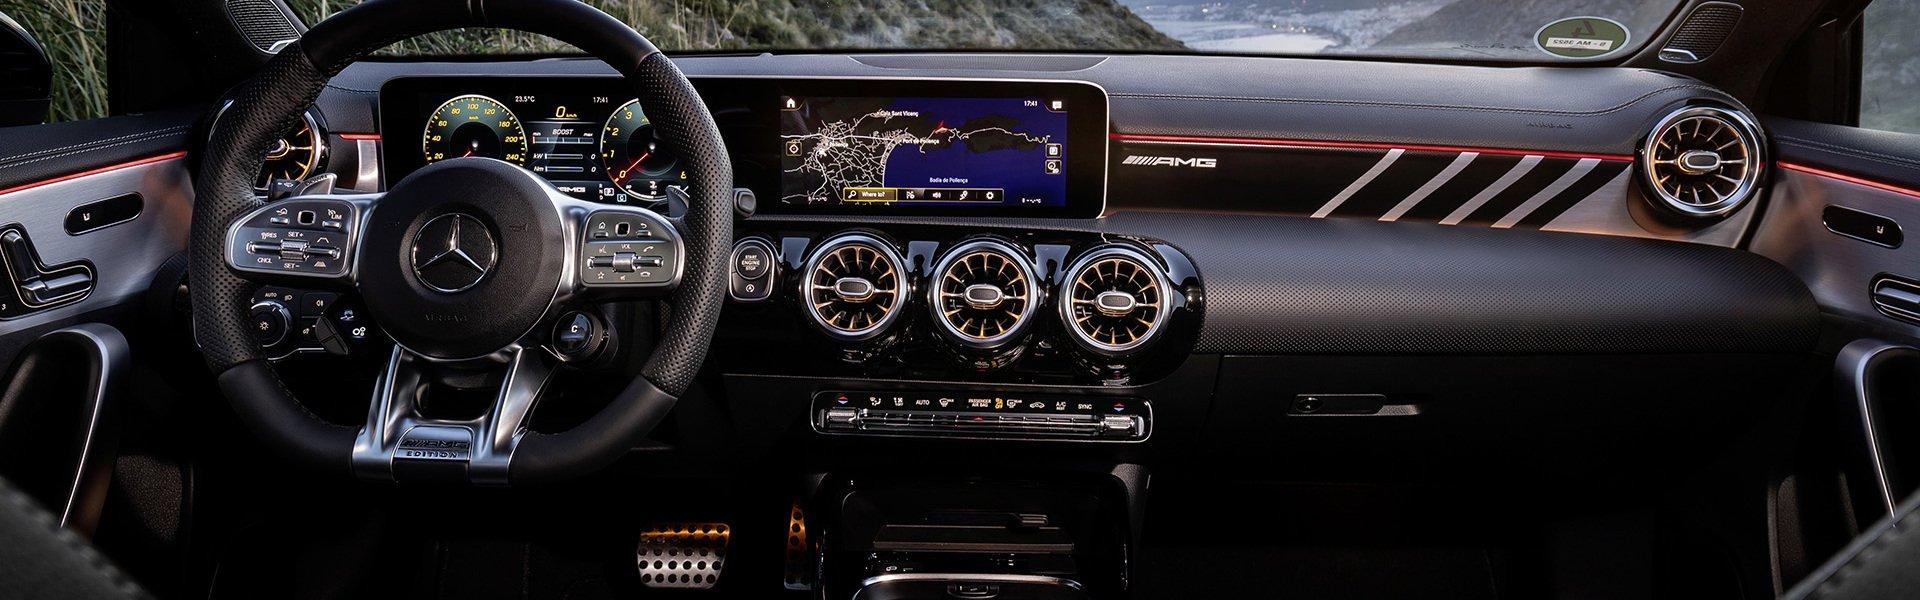 Mercedes-AMG A-Класс хэтчбек